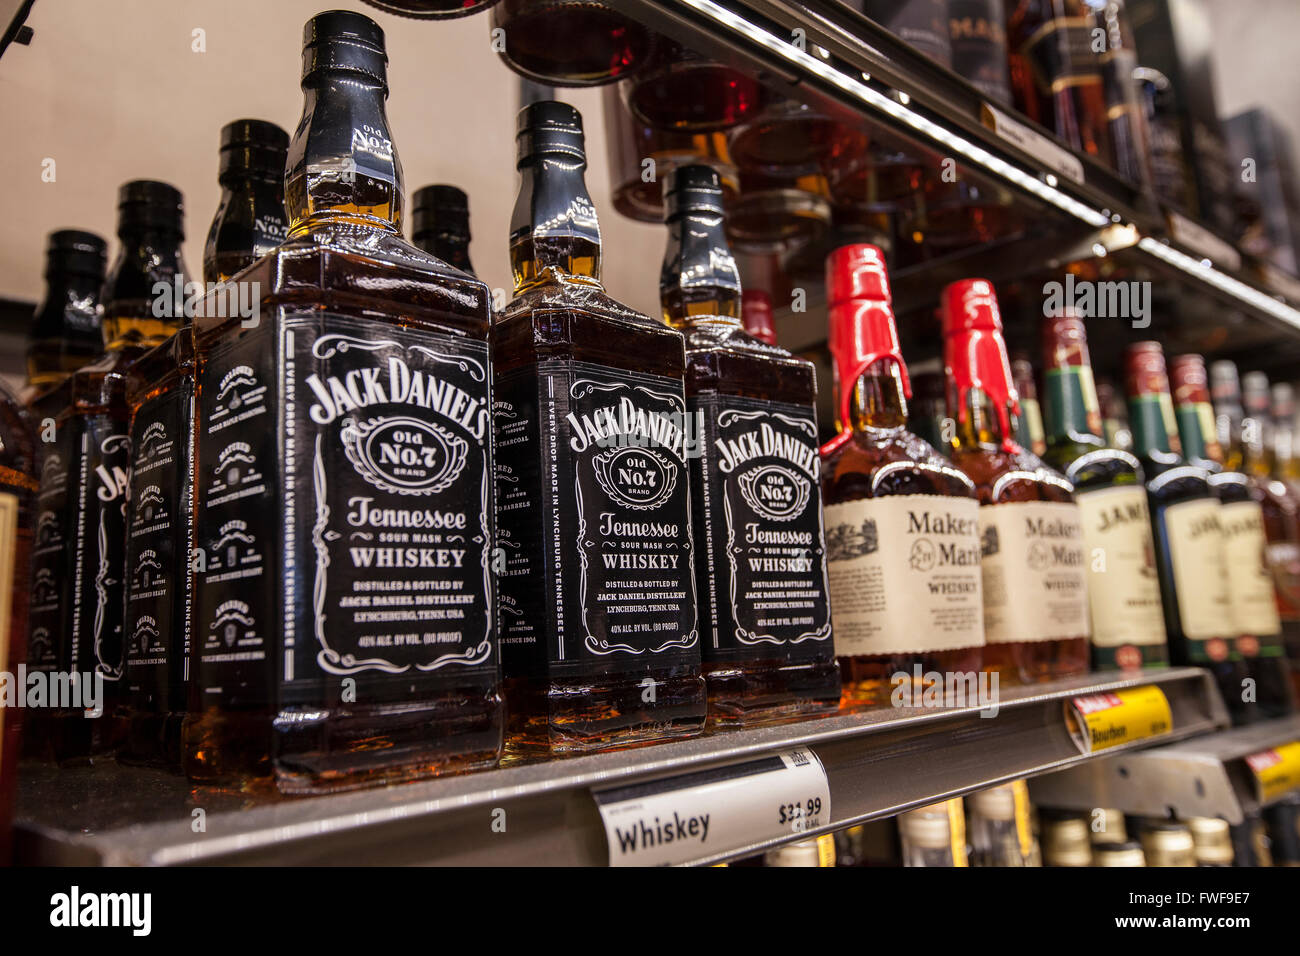 jack daniels stock photos jack daniels stock images alamy